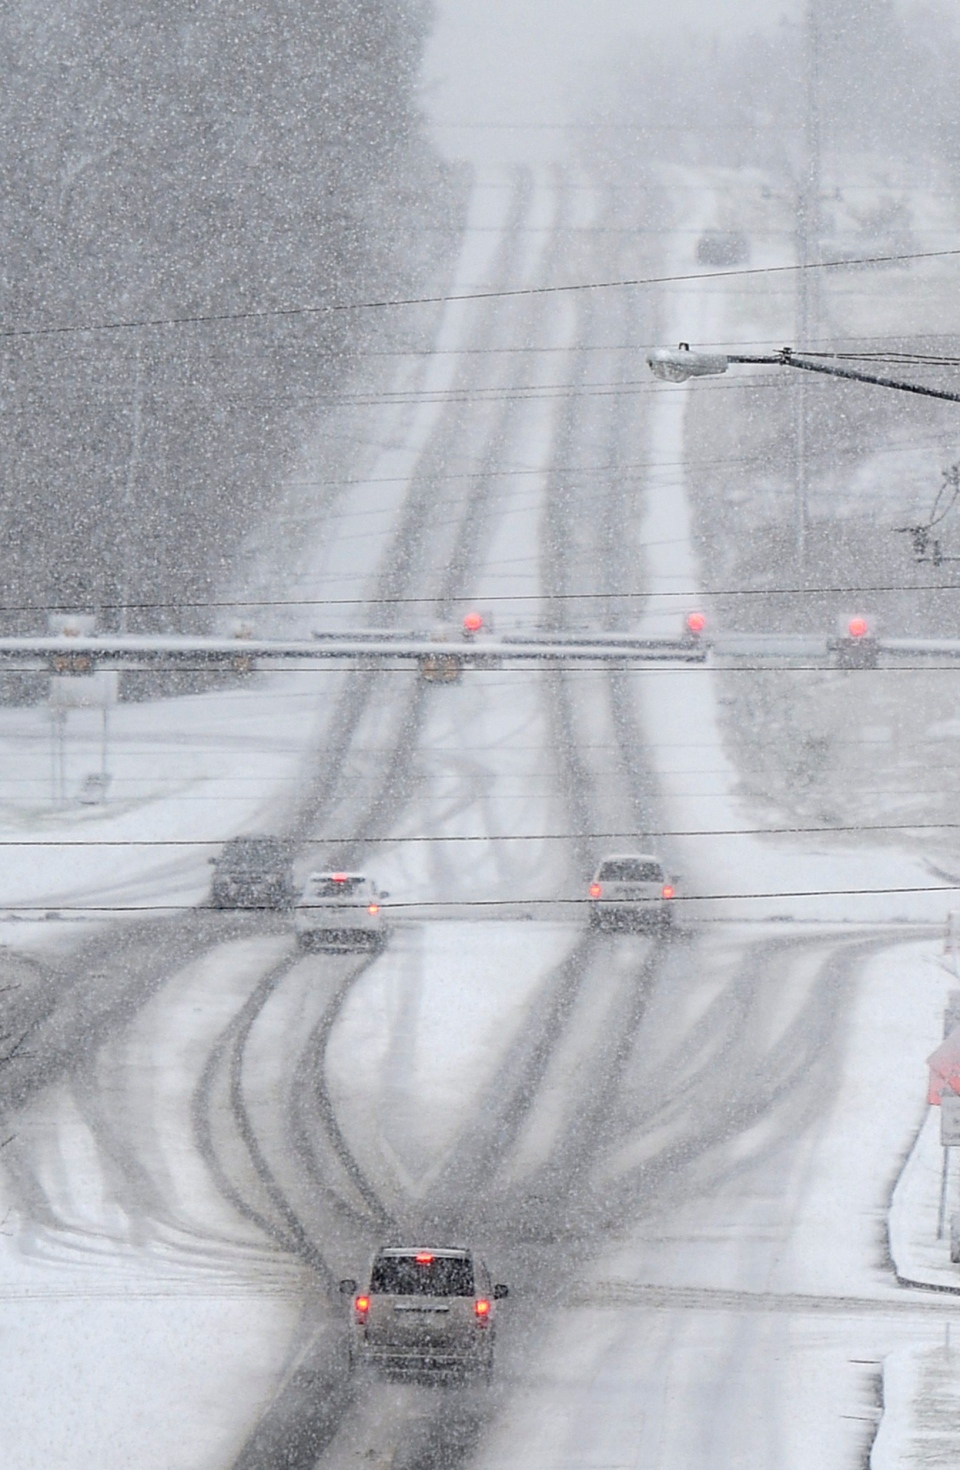 Drivers make their way through falling snow, Friday, Jan. 22, 2016, in Franklin, Tenn. (Shelley Mays / The Tennessean)